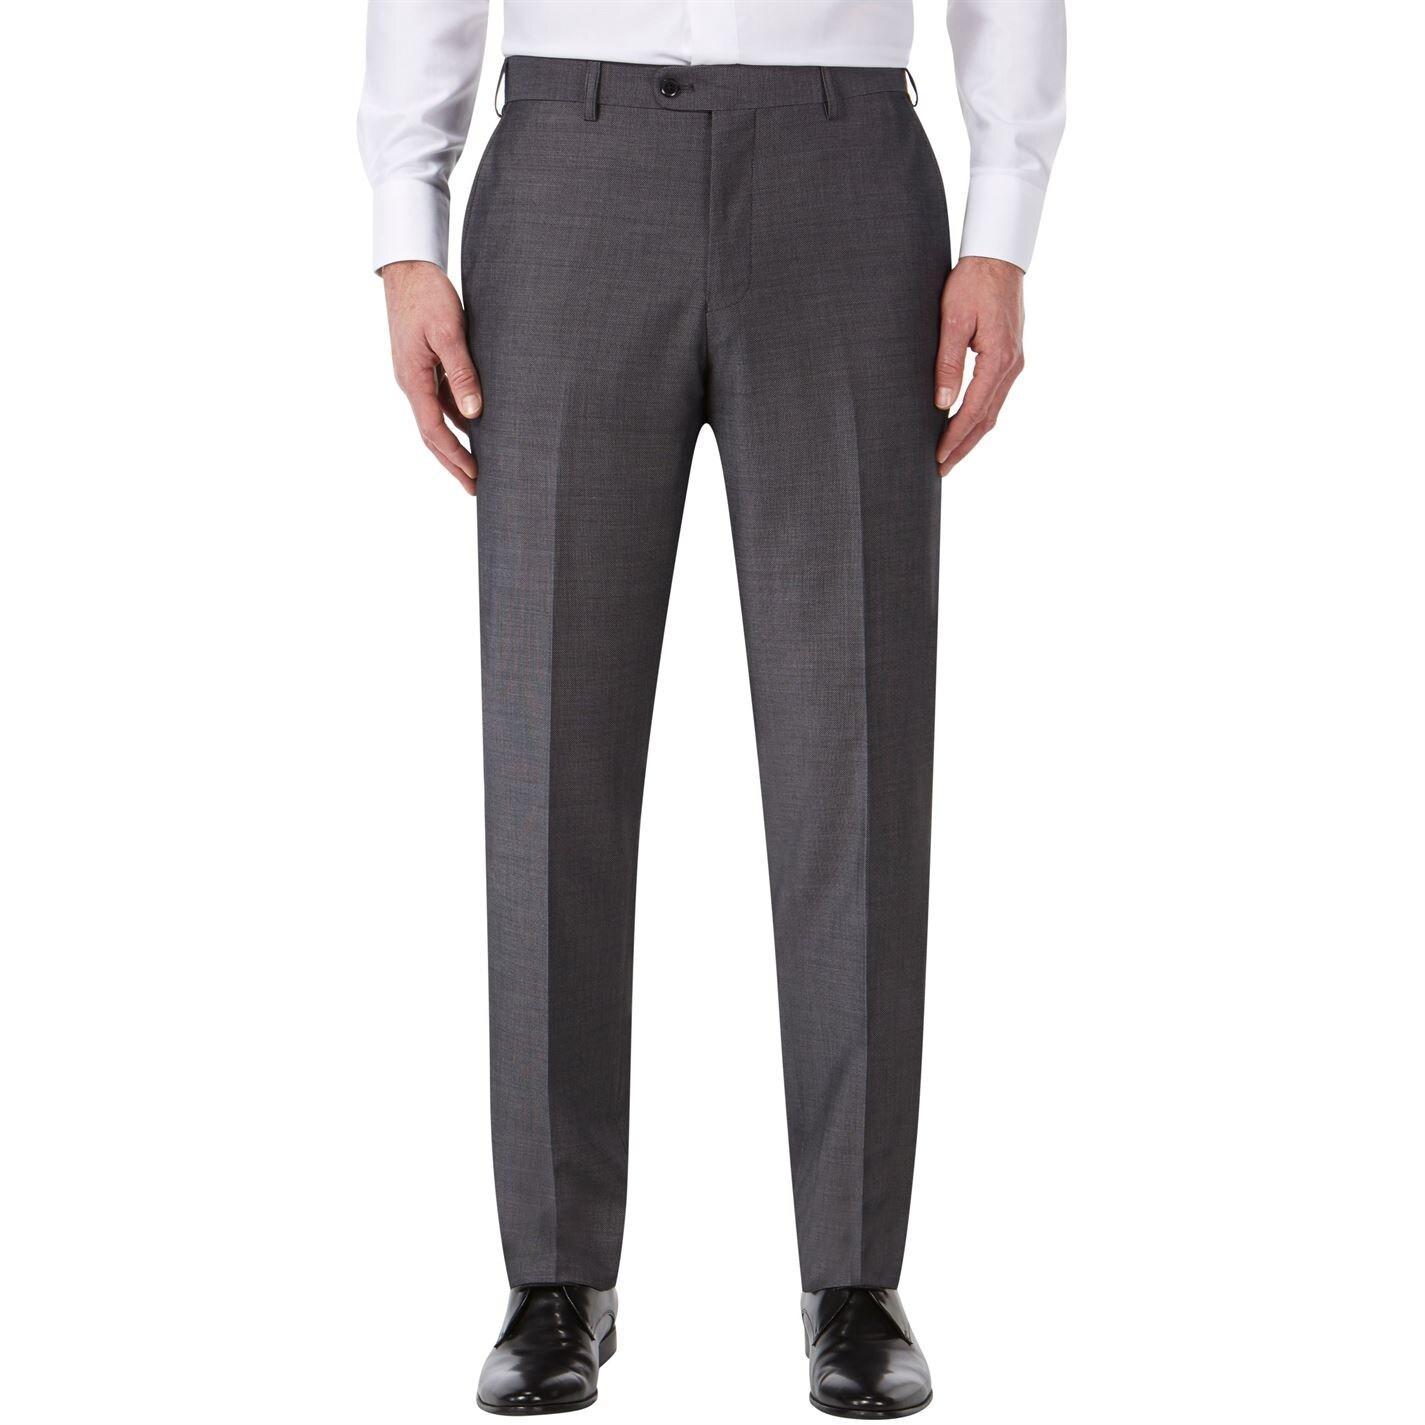 Skopes Redford Tailored Trouser in Grey (Grey) for Men